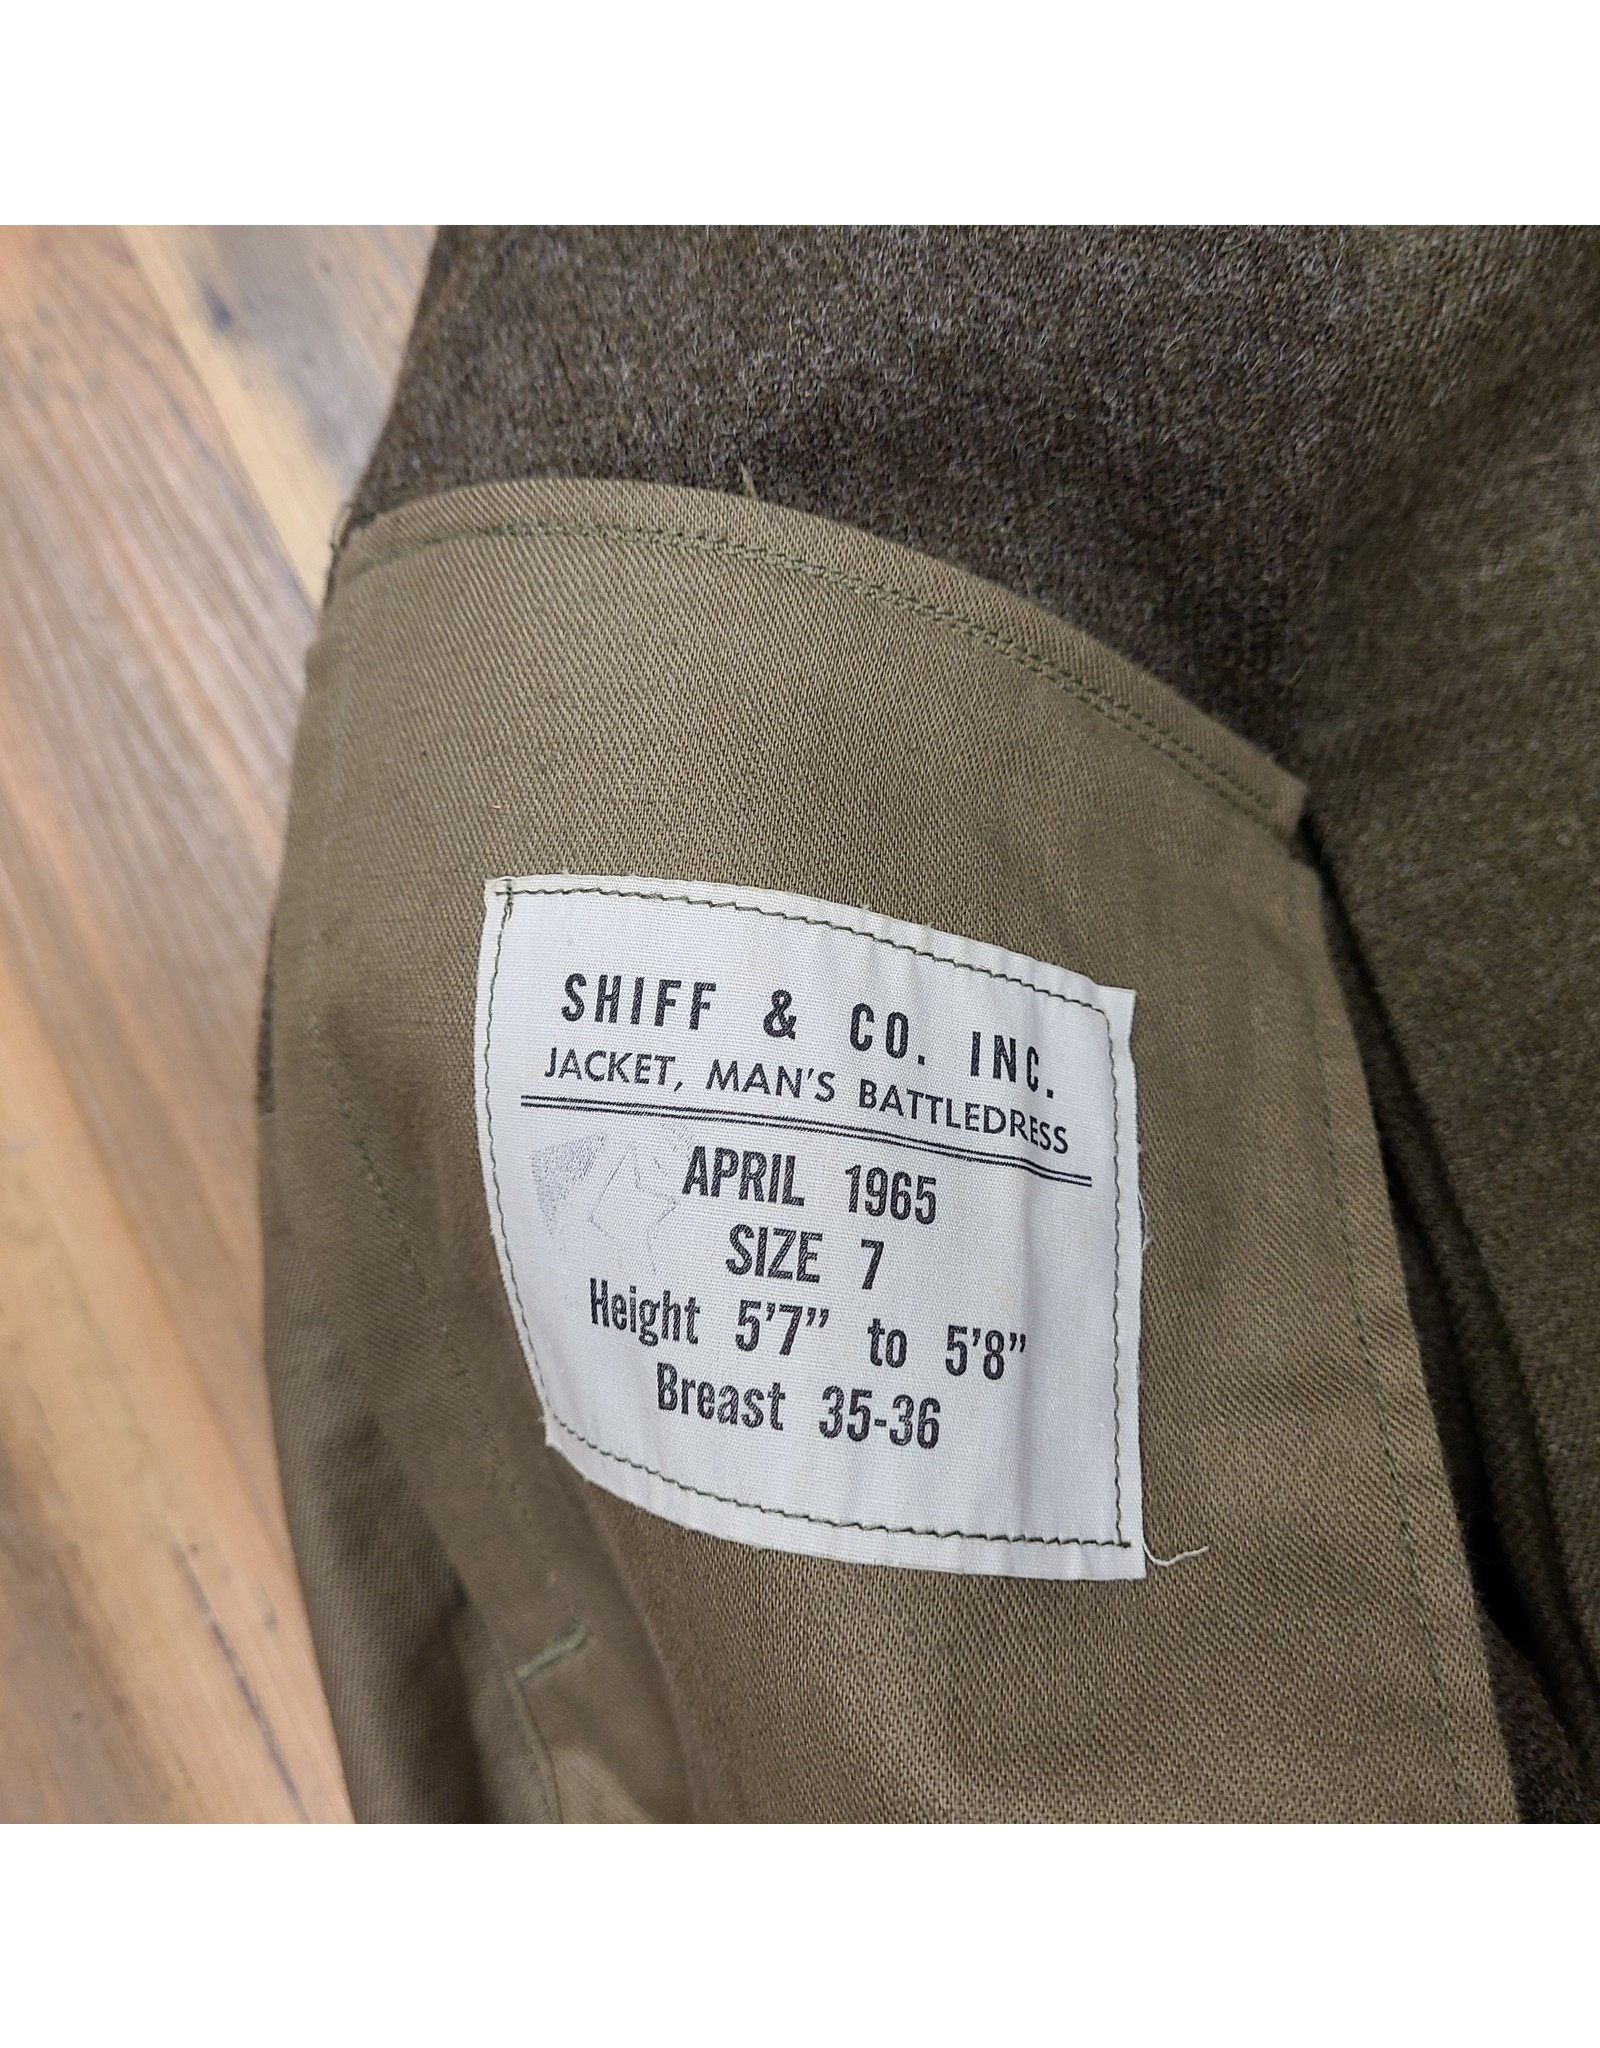 "CANADIAN SURPLUS CANADIAN ORDANCE CORPS DRESS  W/UN PATCH SZ 5'7"" HEIGHT 35-36 CHEST"